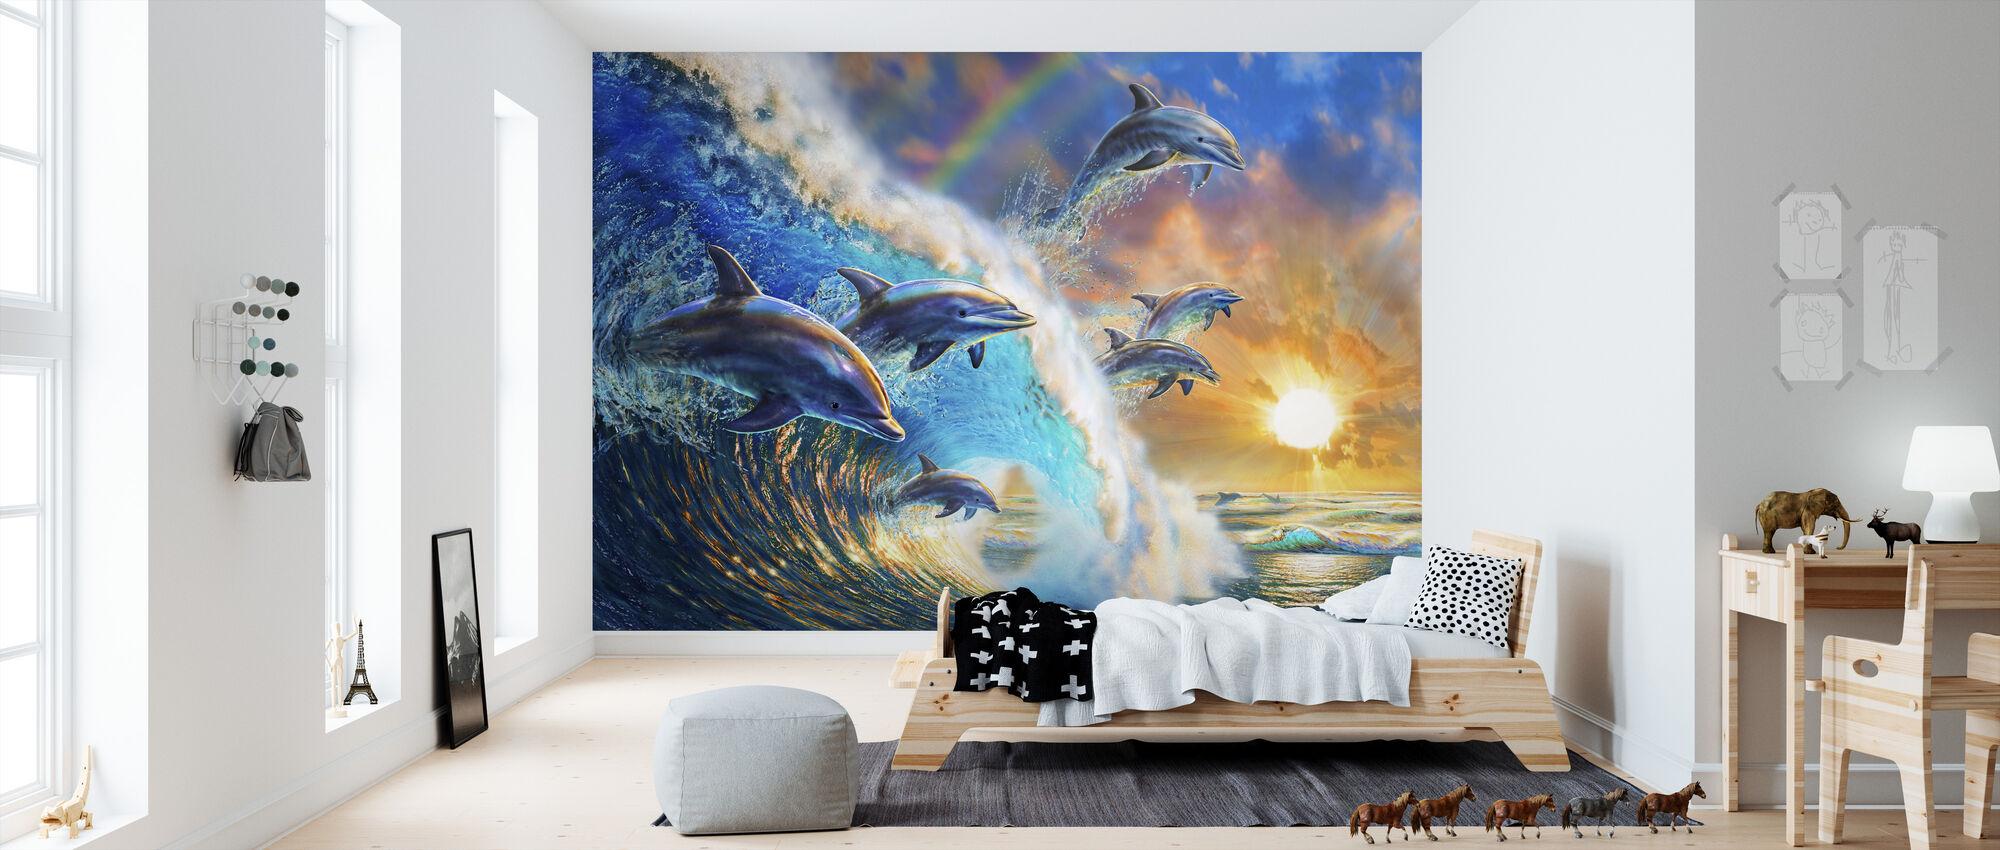 Delfinbølge - Tapet - Barnerom